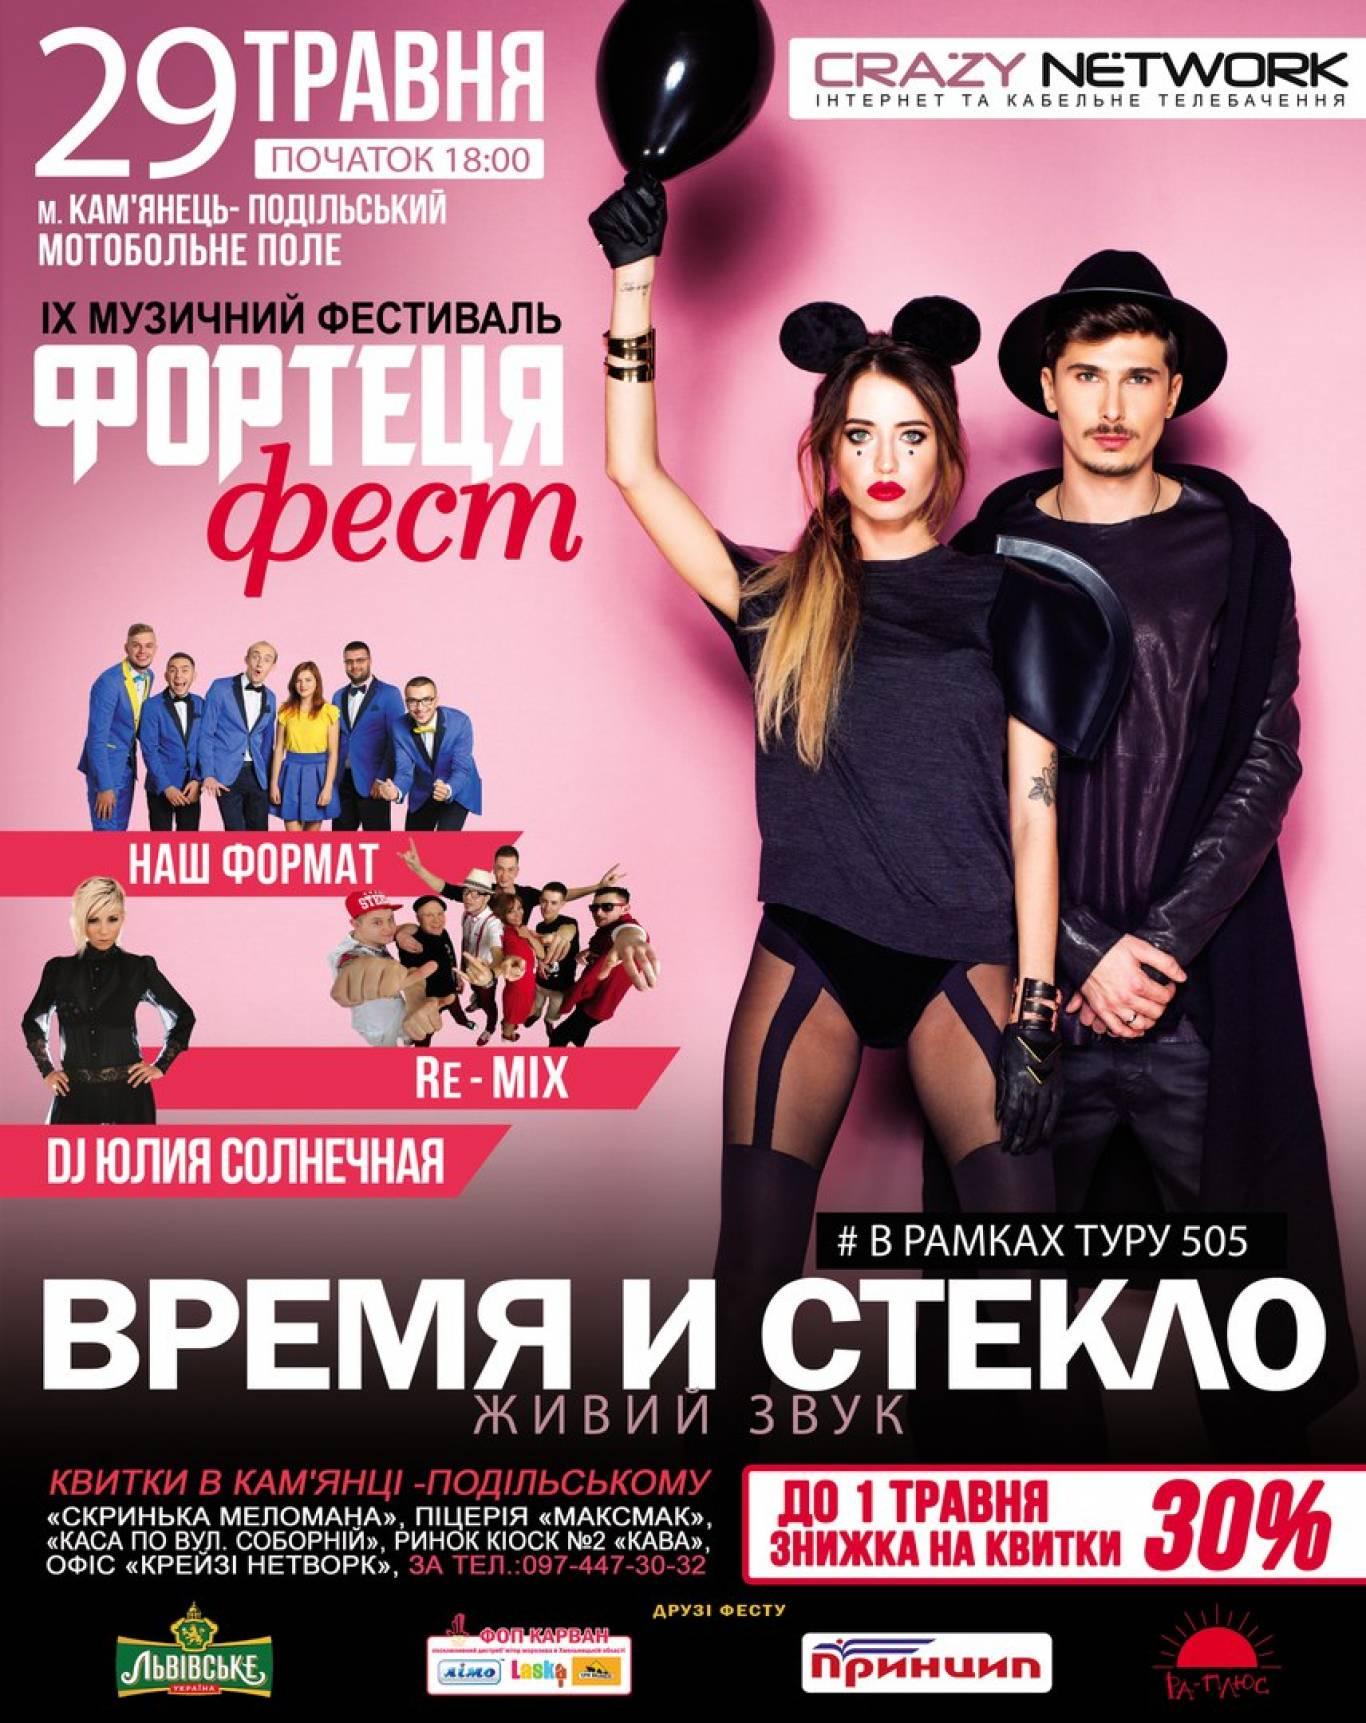 Фортеця фест 2016 у Кам'янці-Подільському